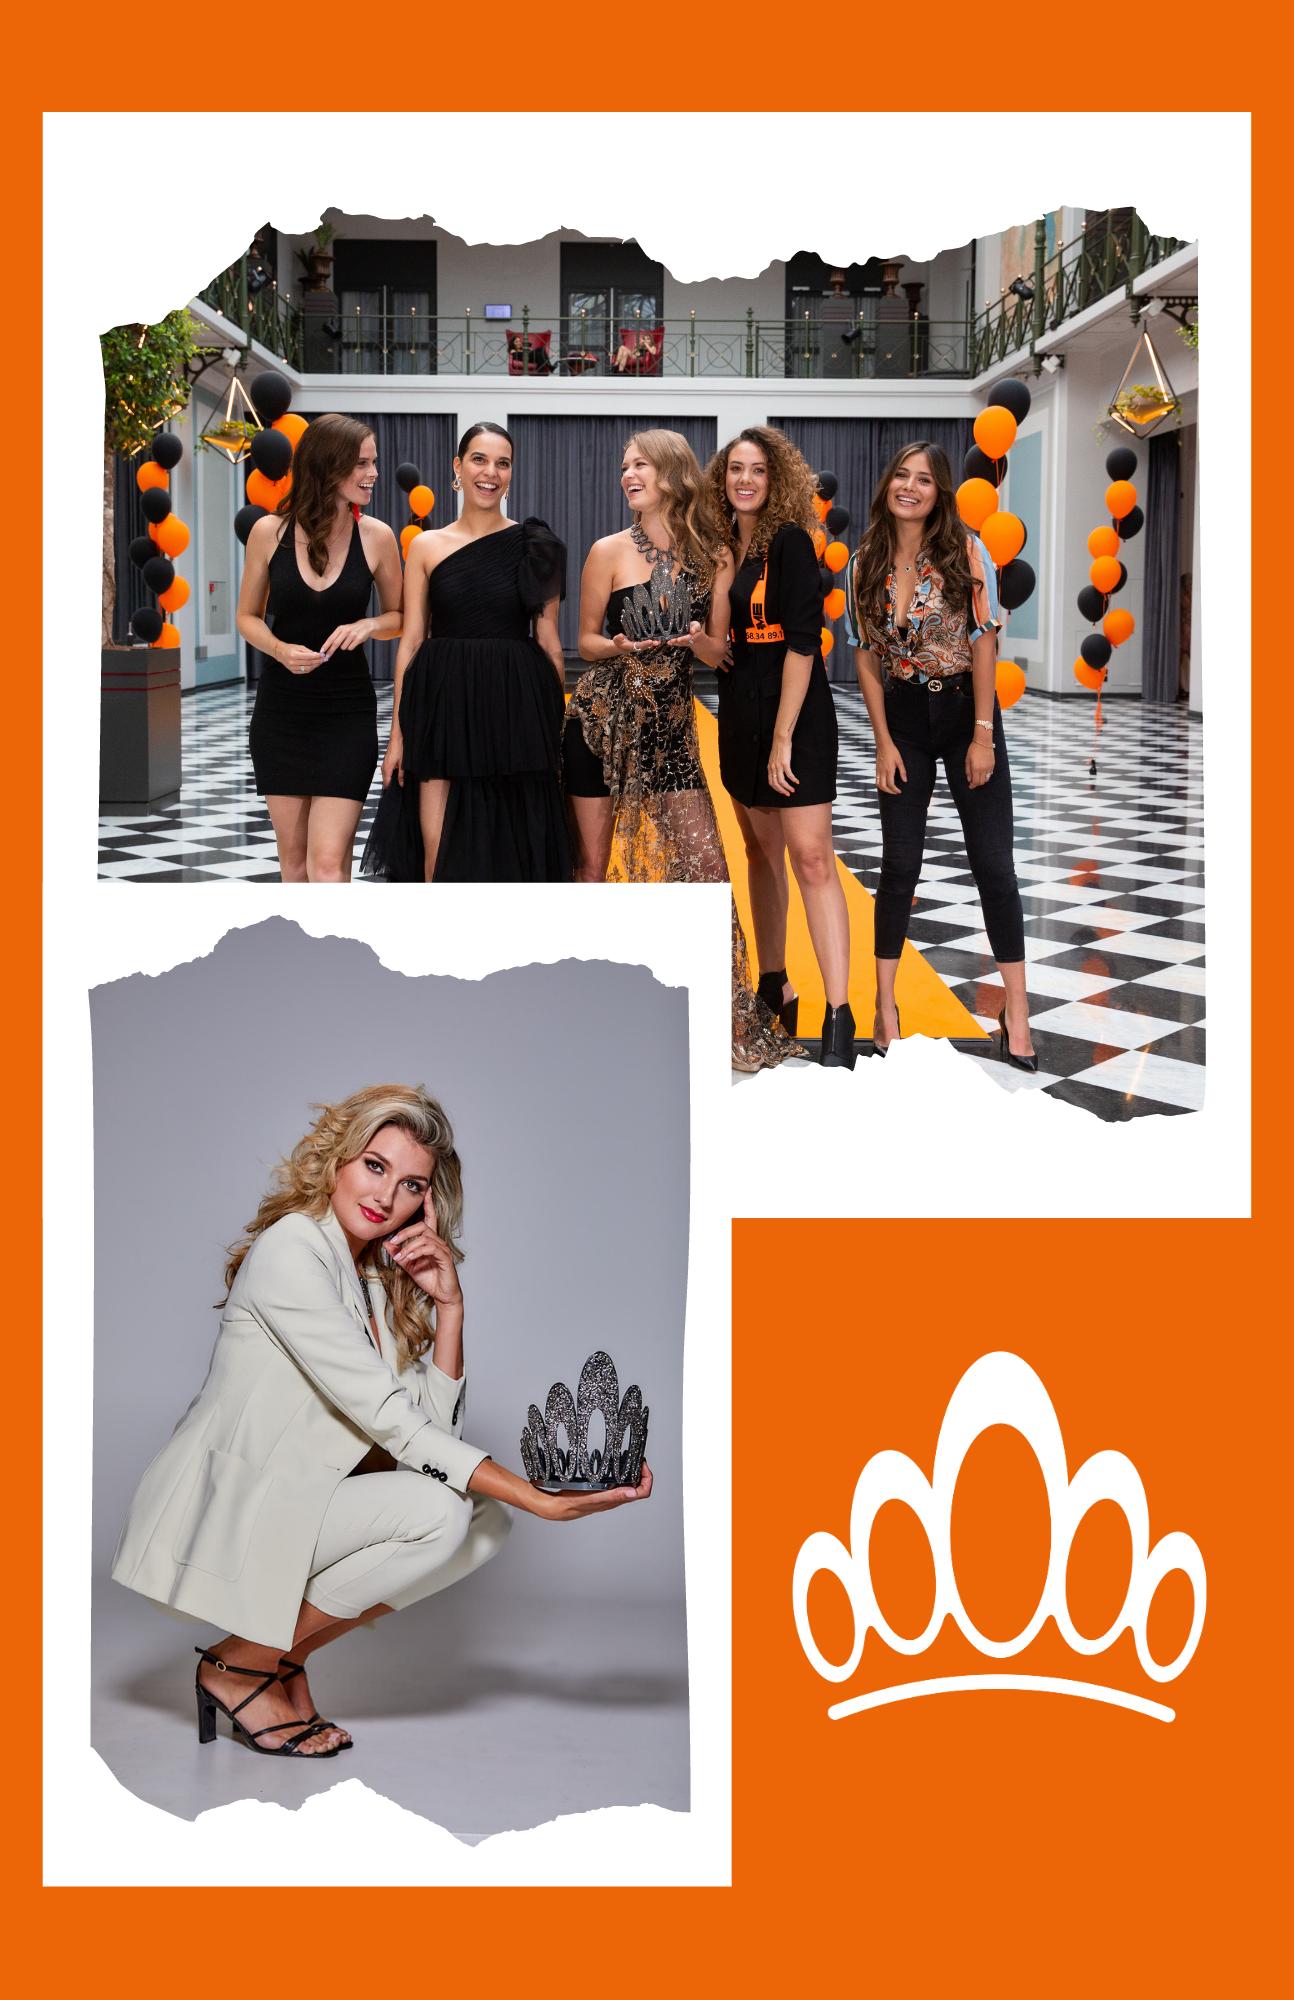 Miss Nederland kroon_ Nicky Opheij, Rahoma Dirkse_Sharon Pieksma, Zoey Ivory, Yasmin Verheije